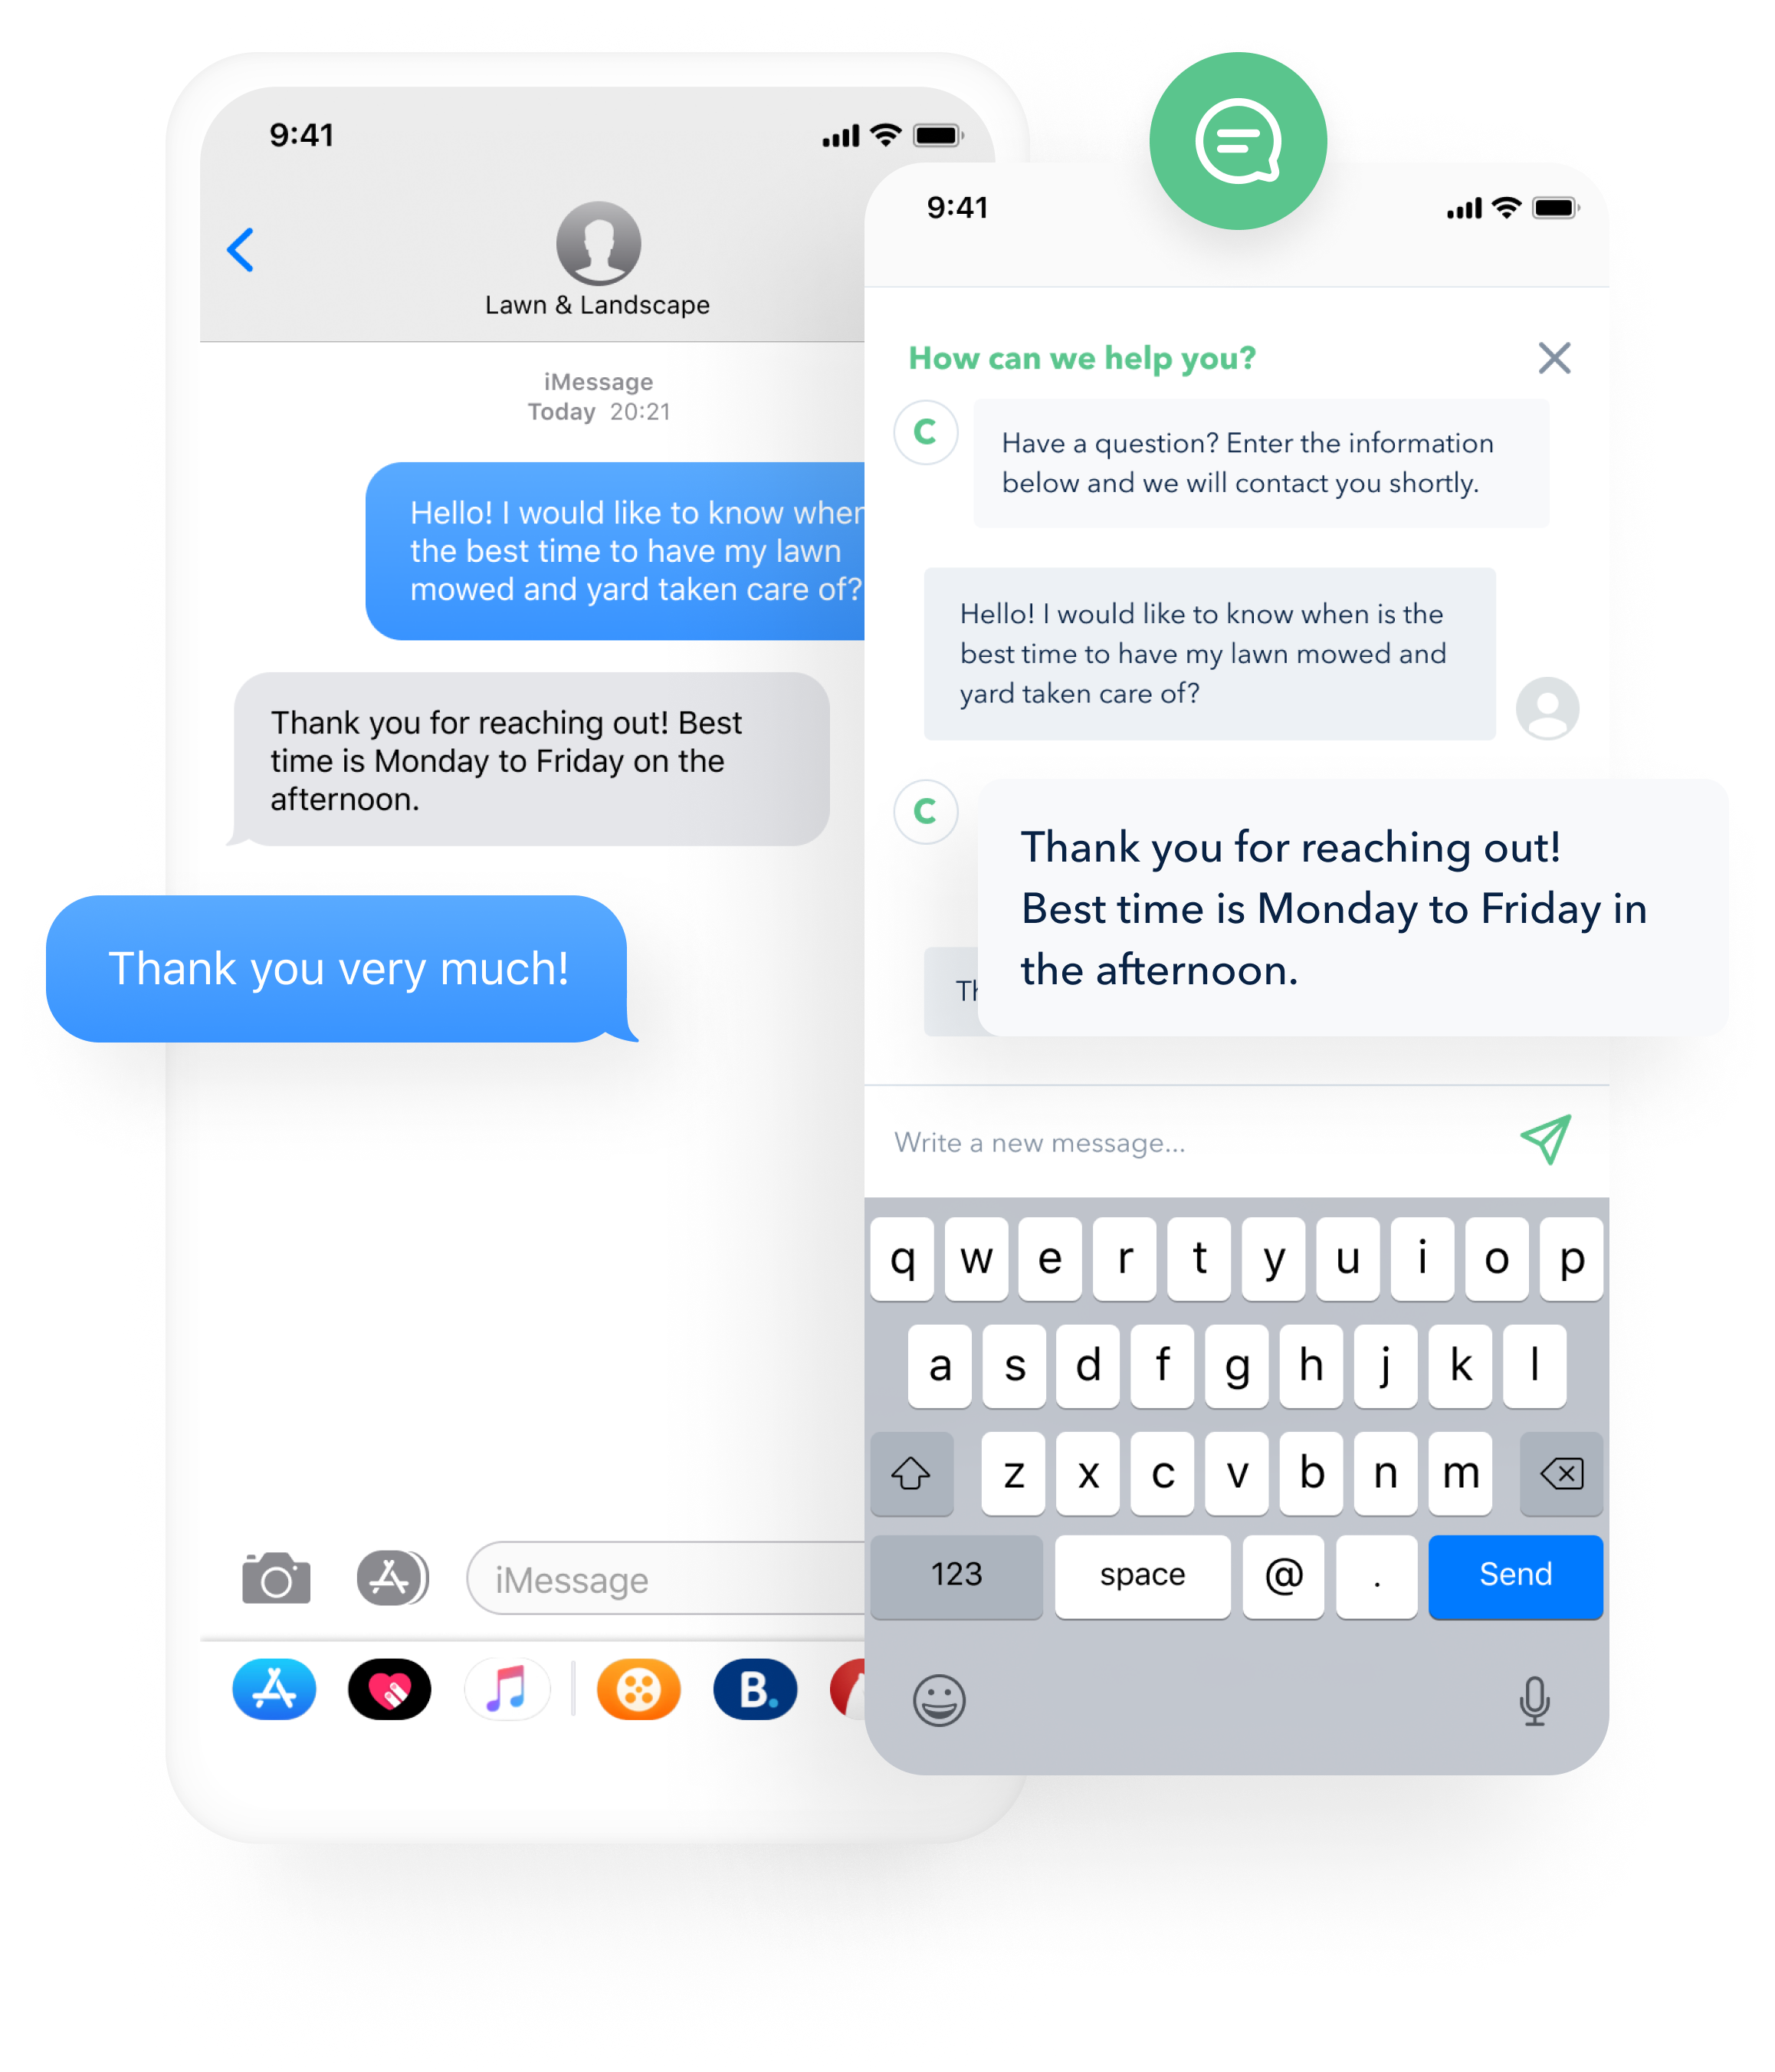 GoSite's messenger tool